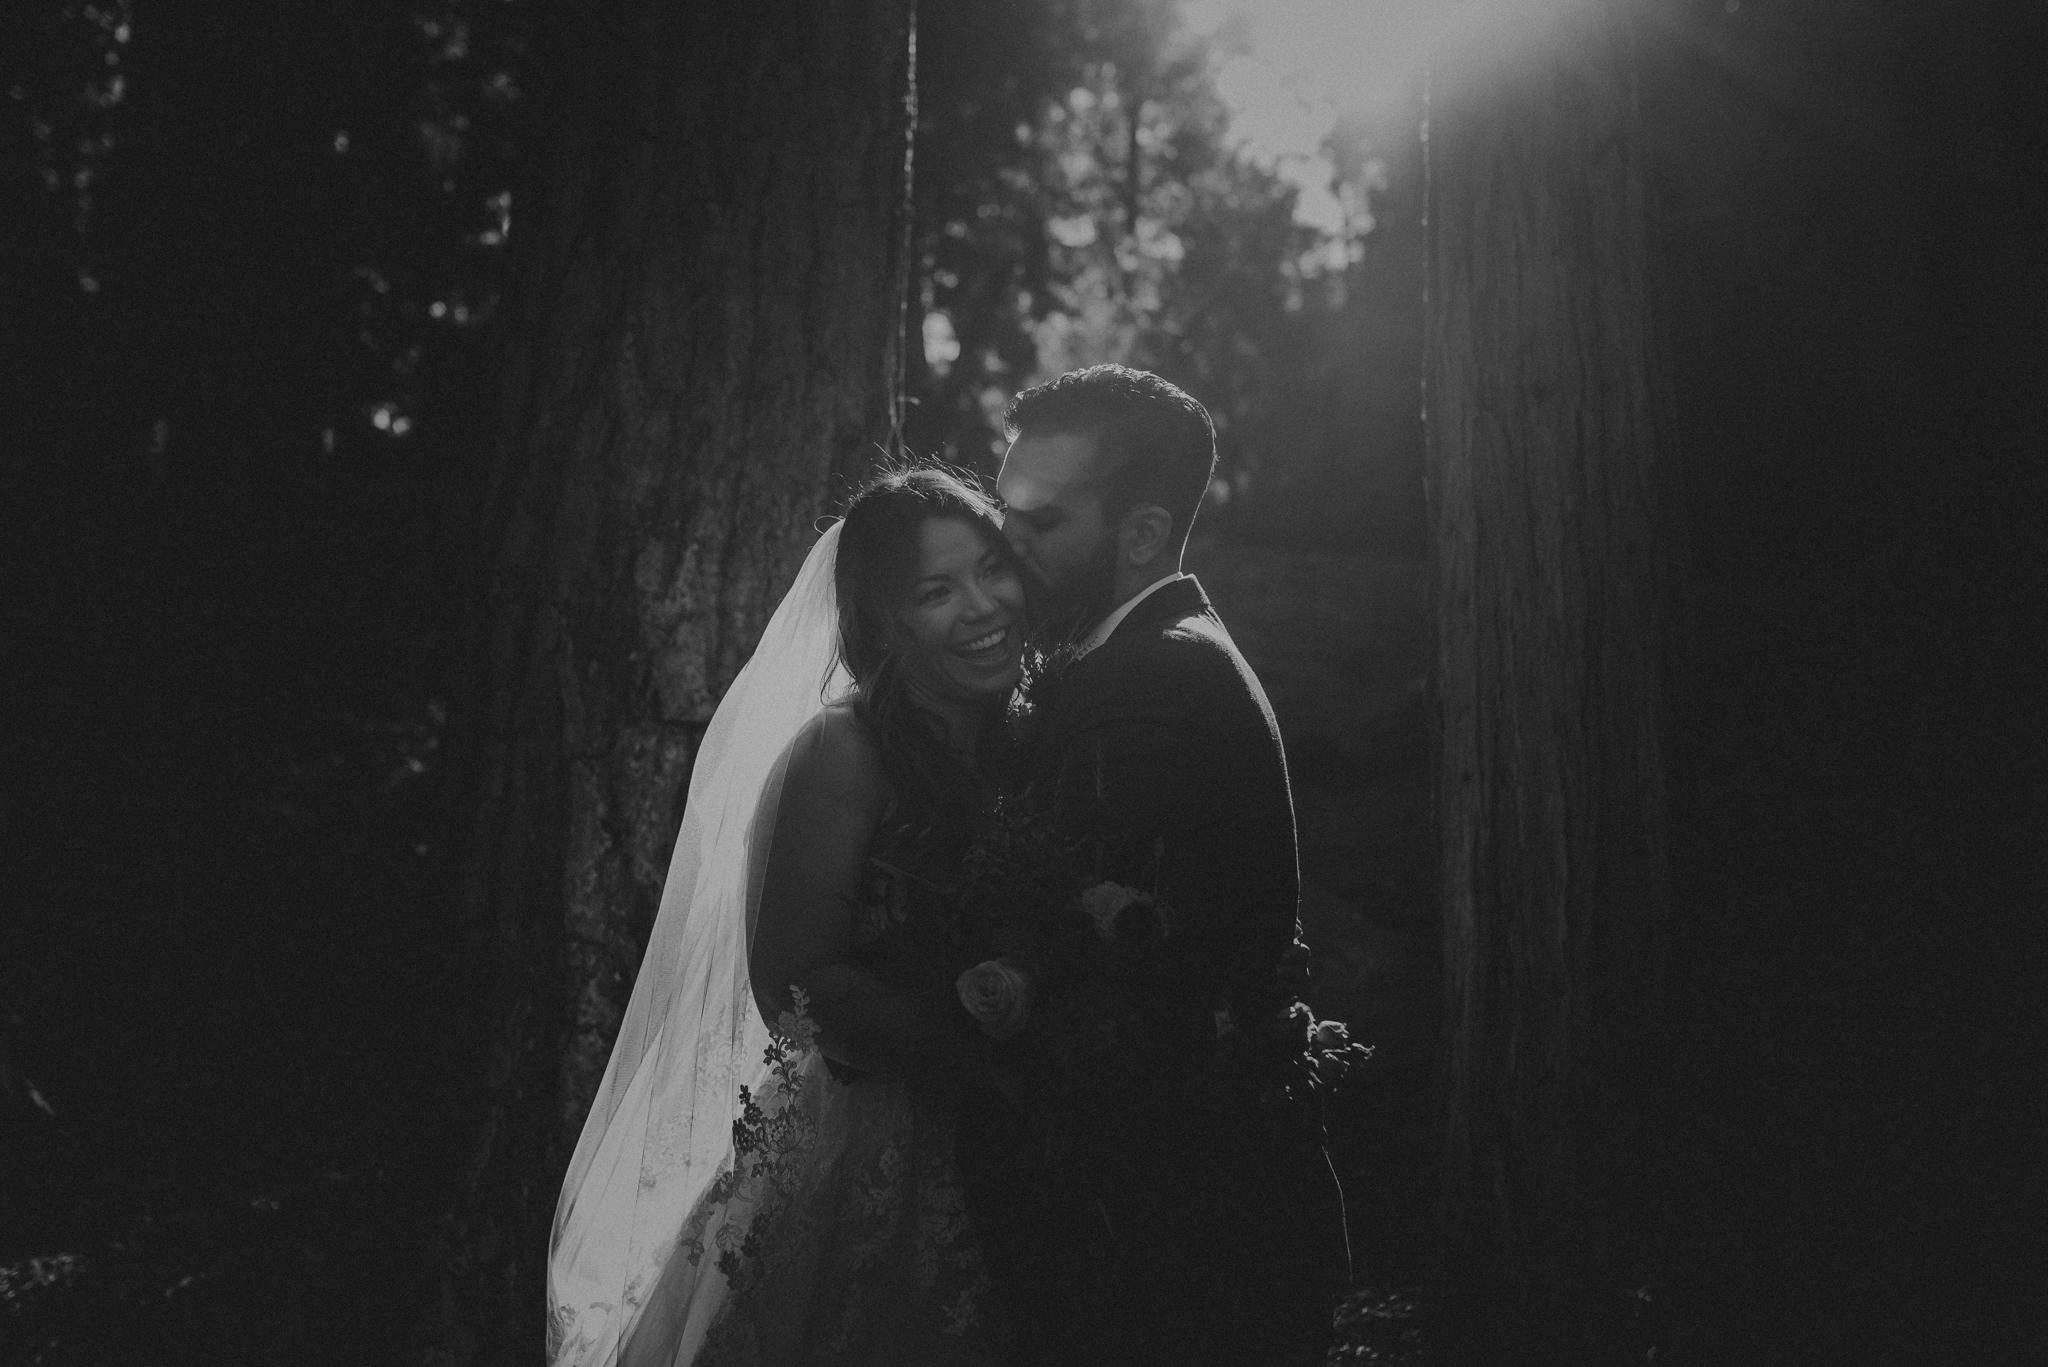 Yosemite Elopement Photographer - Evergreen Lodge Wedding Photographer - IsaiahAndTaylor.com-113.jpg